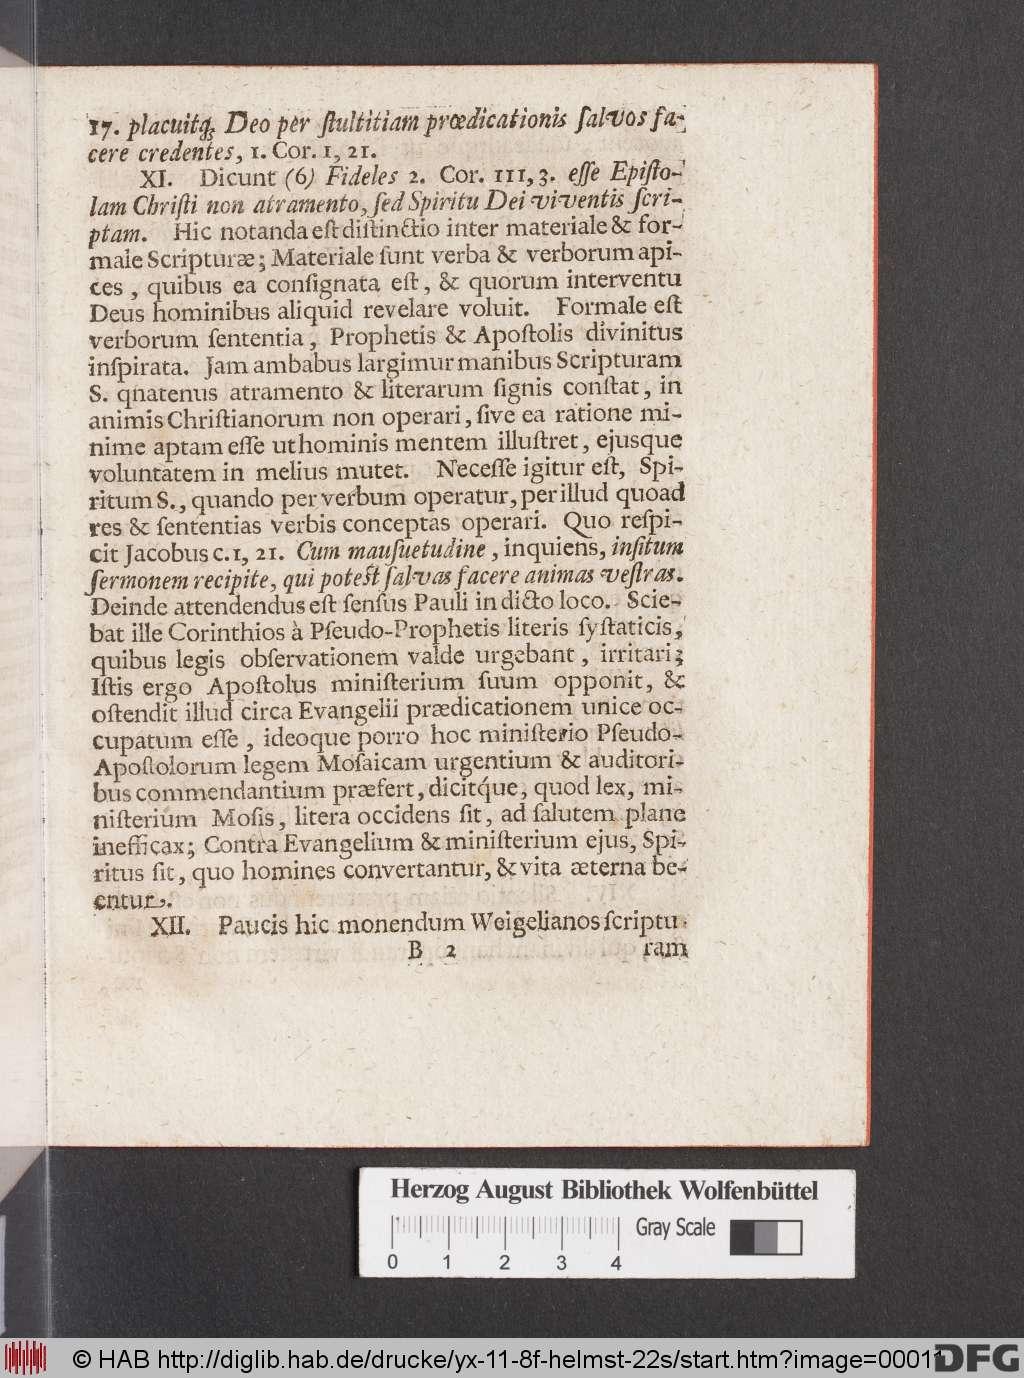 http://diglib.hab.de/drucke/yx-11-8f-helmst-22s/00011.jpg